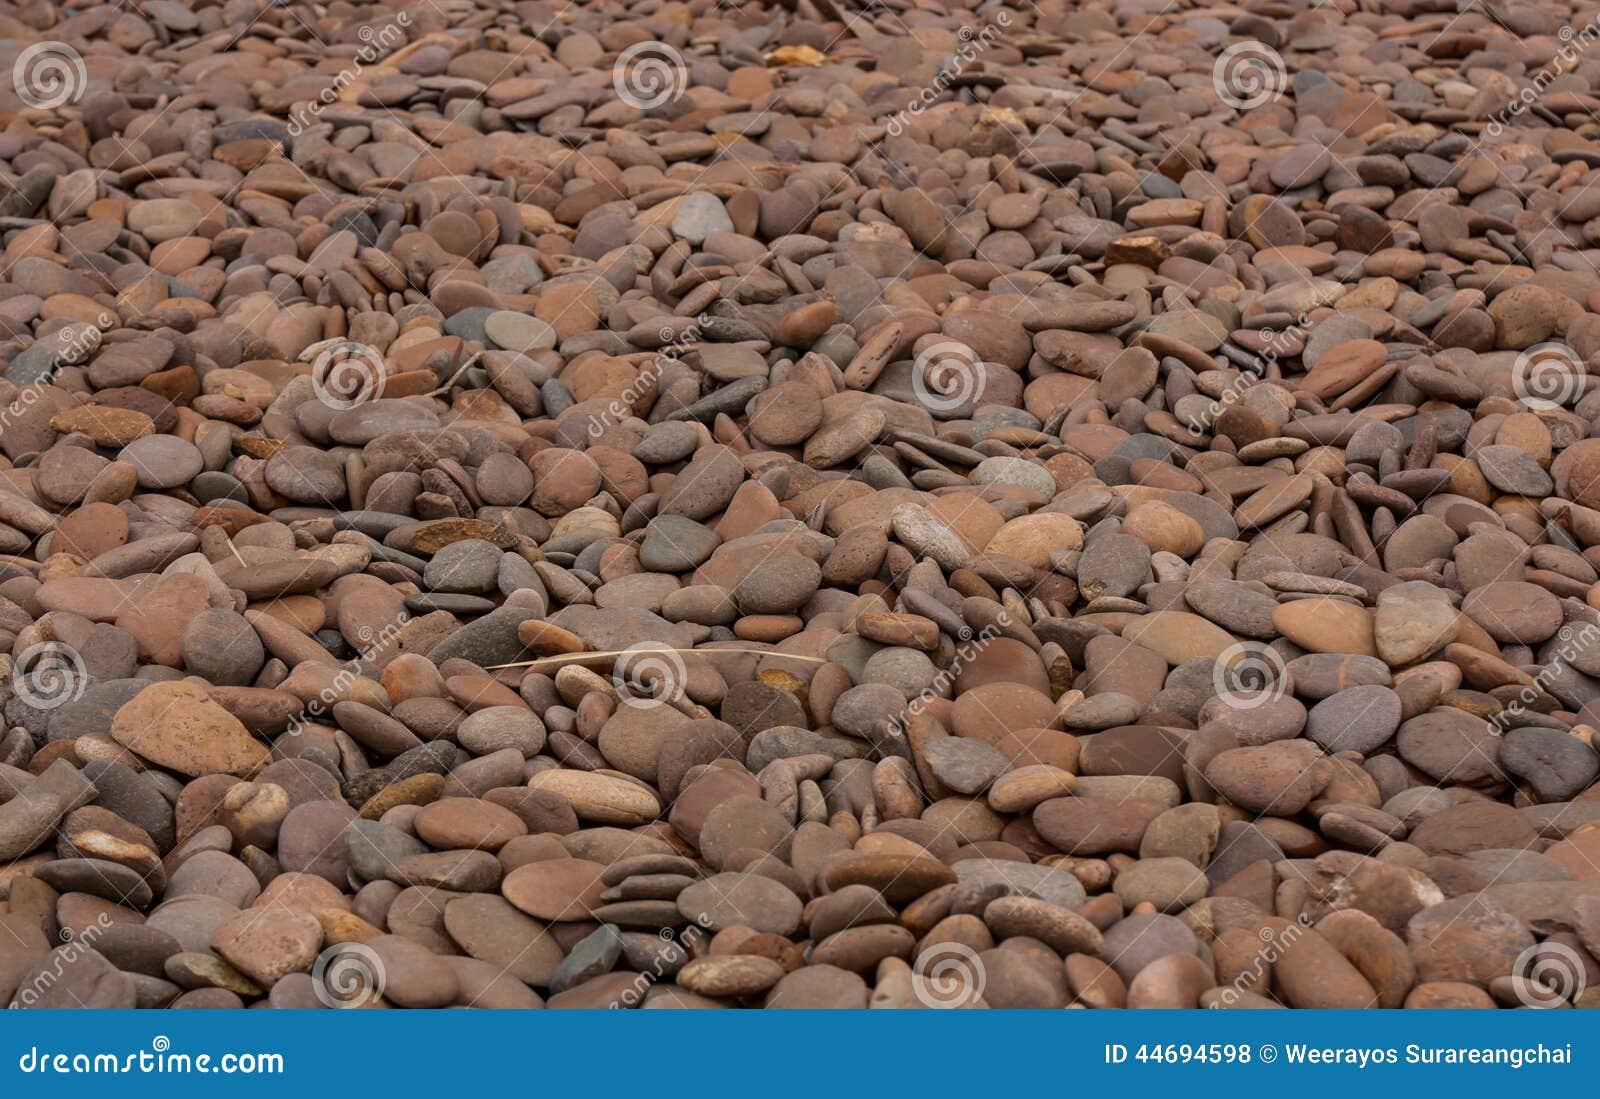 gallery of amazing o with piedra decorativa para jardin with piedras decorativas para jardin with piedra decorativa para jardin - Piedra Decorativa Jardin